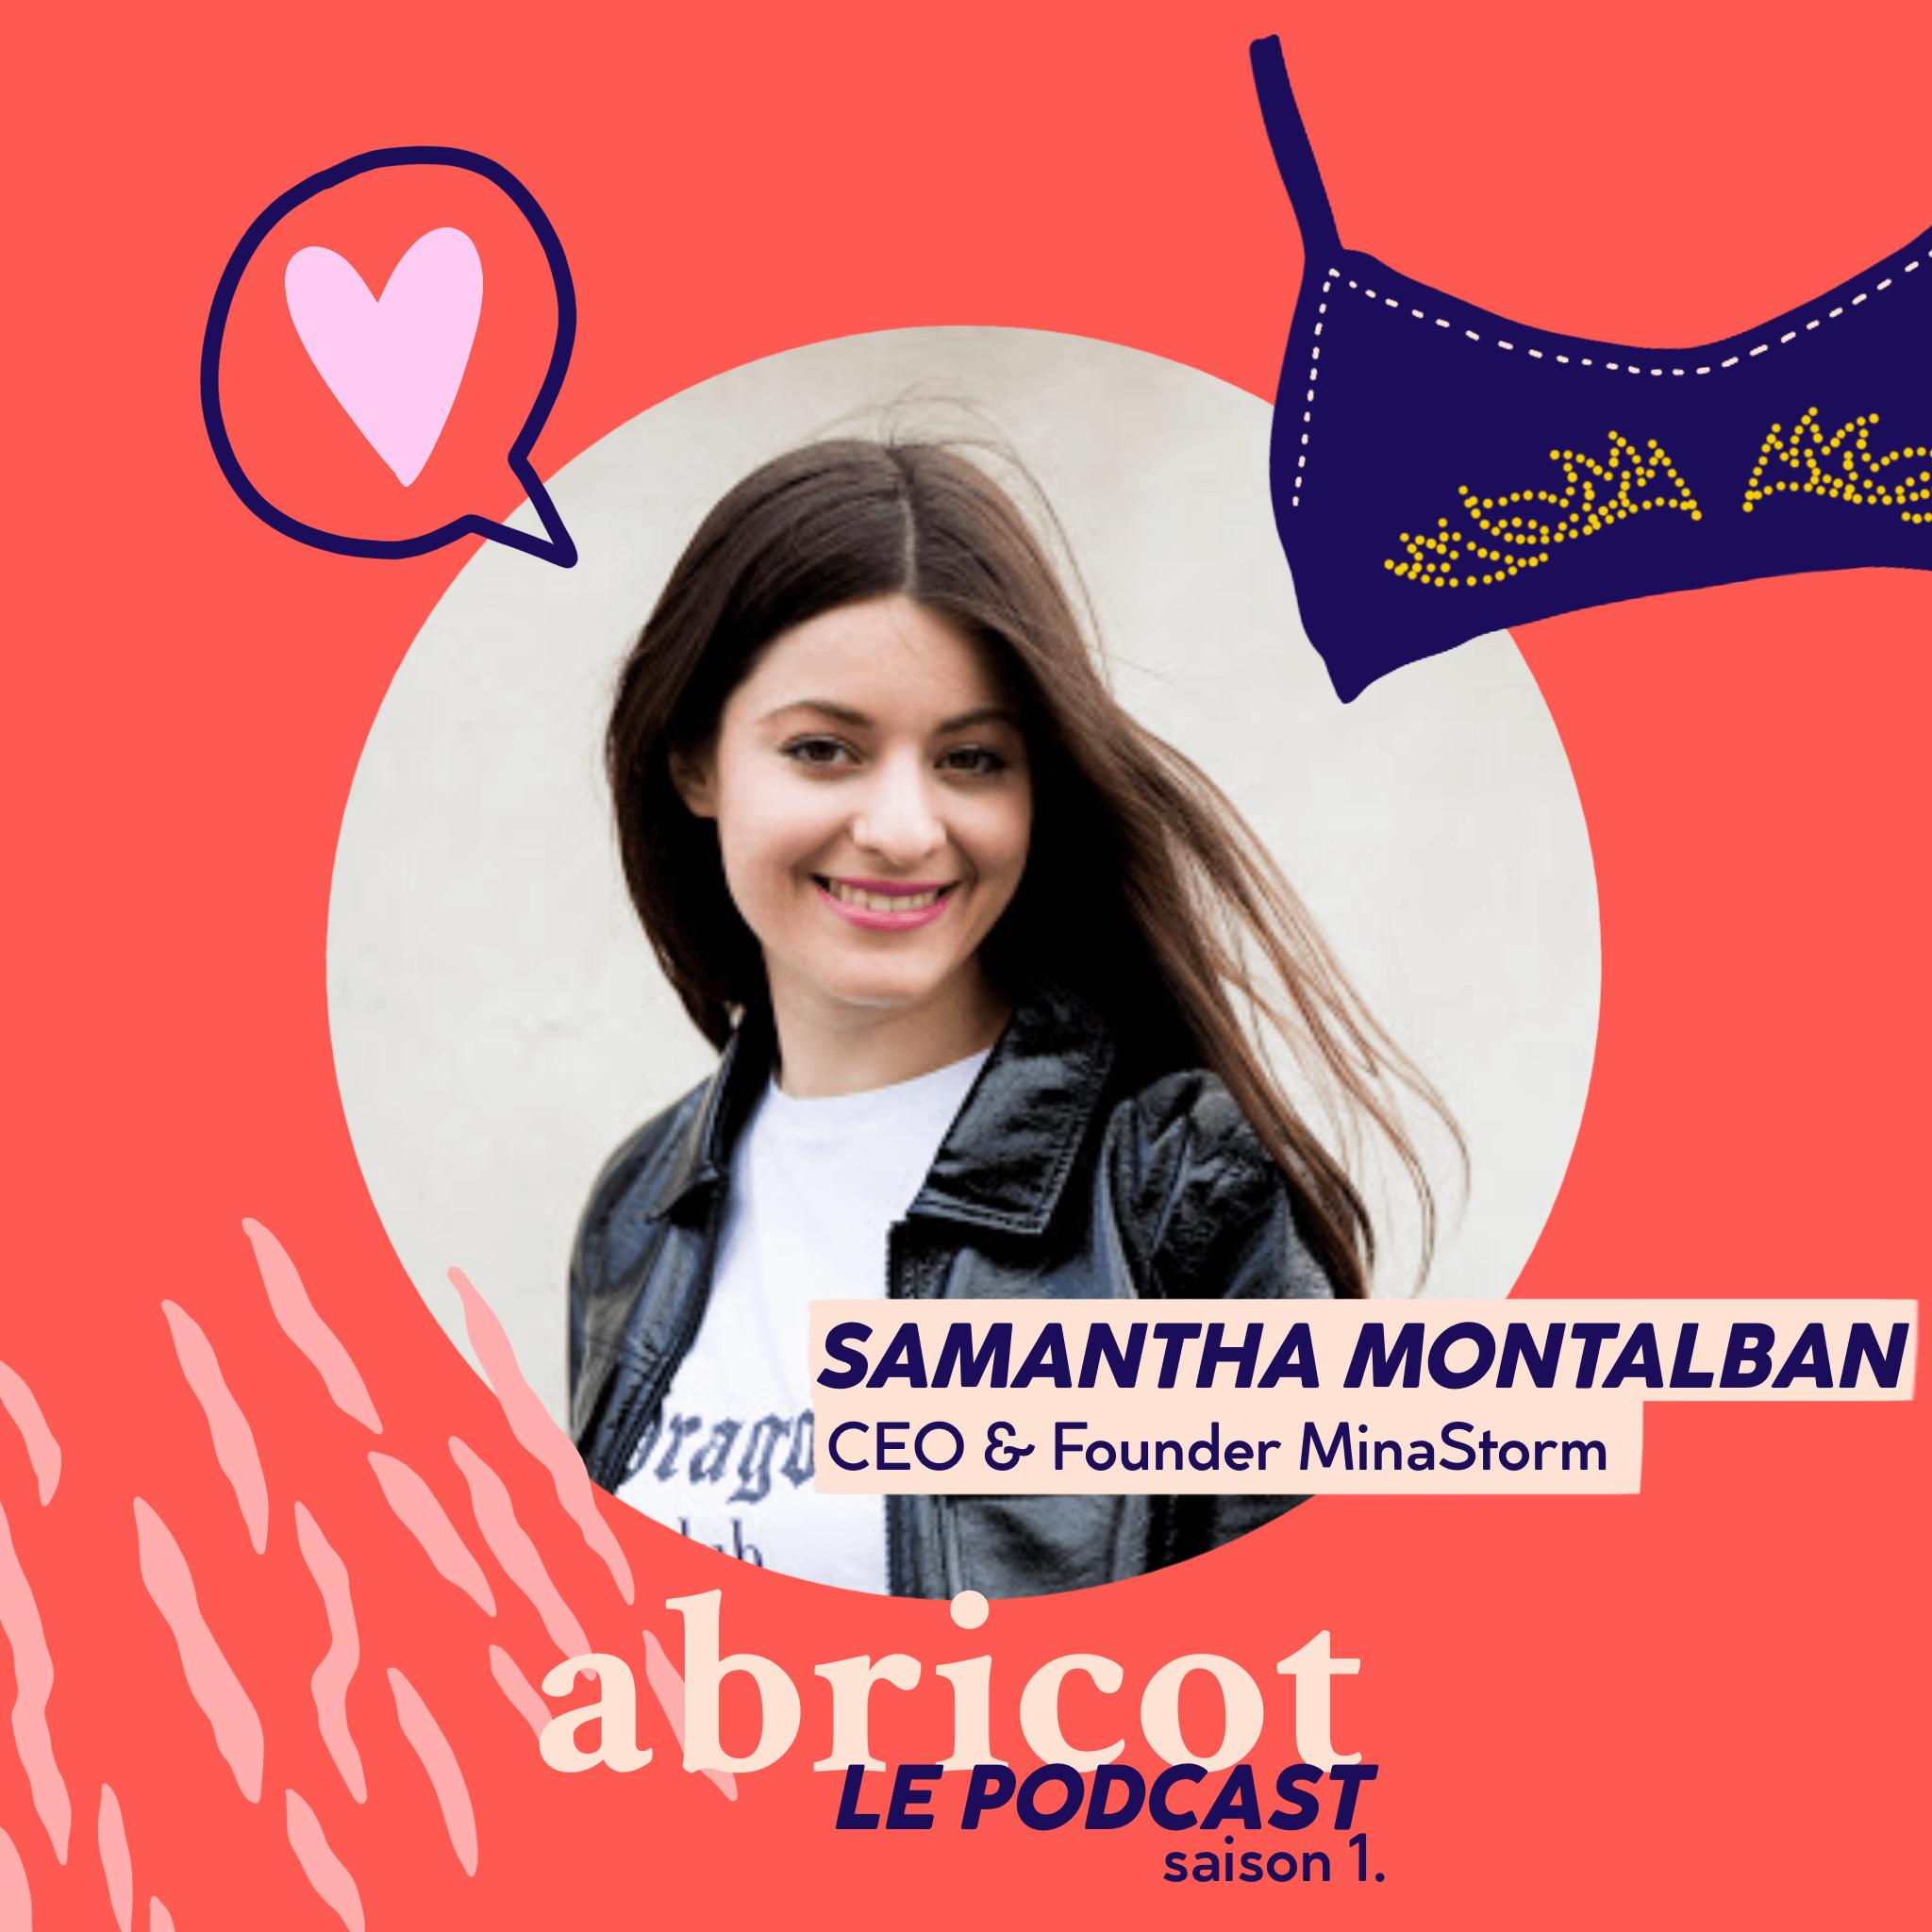 Podcast Abricot épisode 2. Samantha Montalban